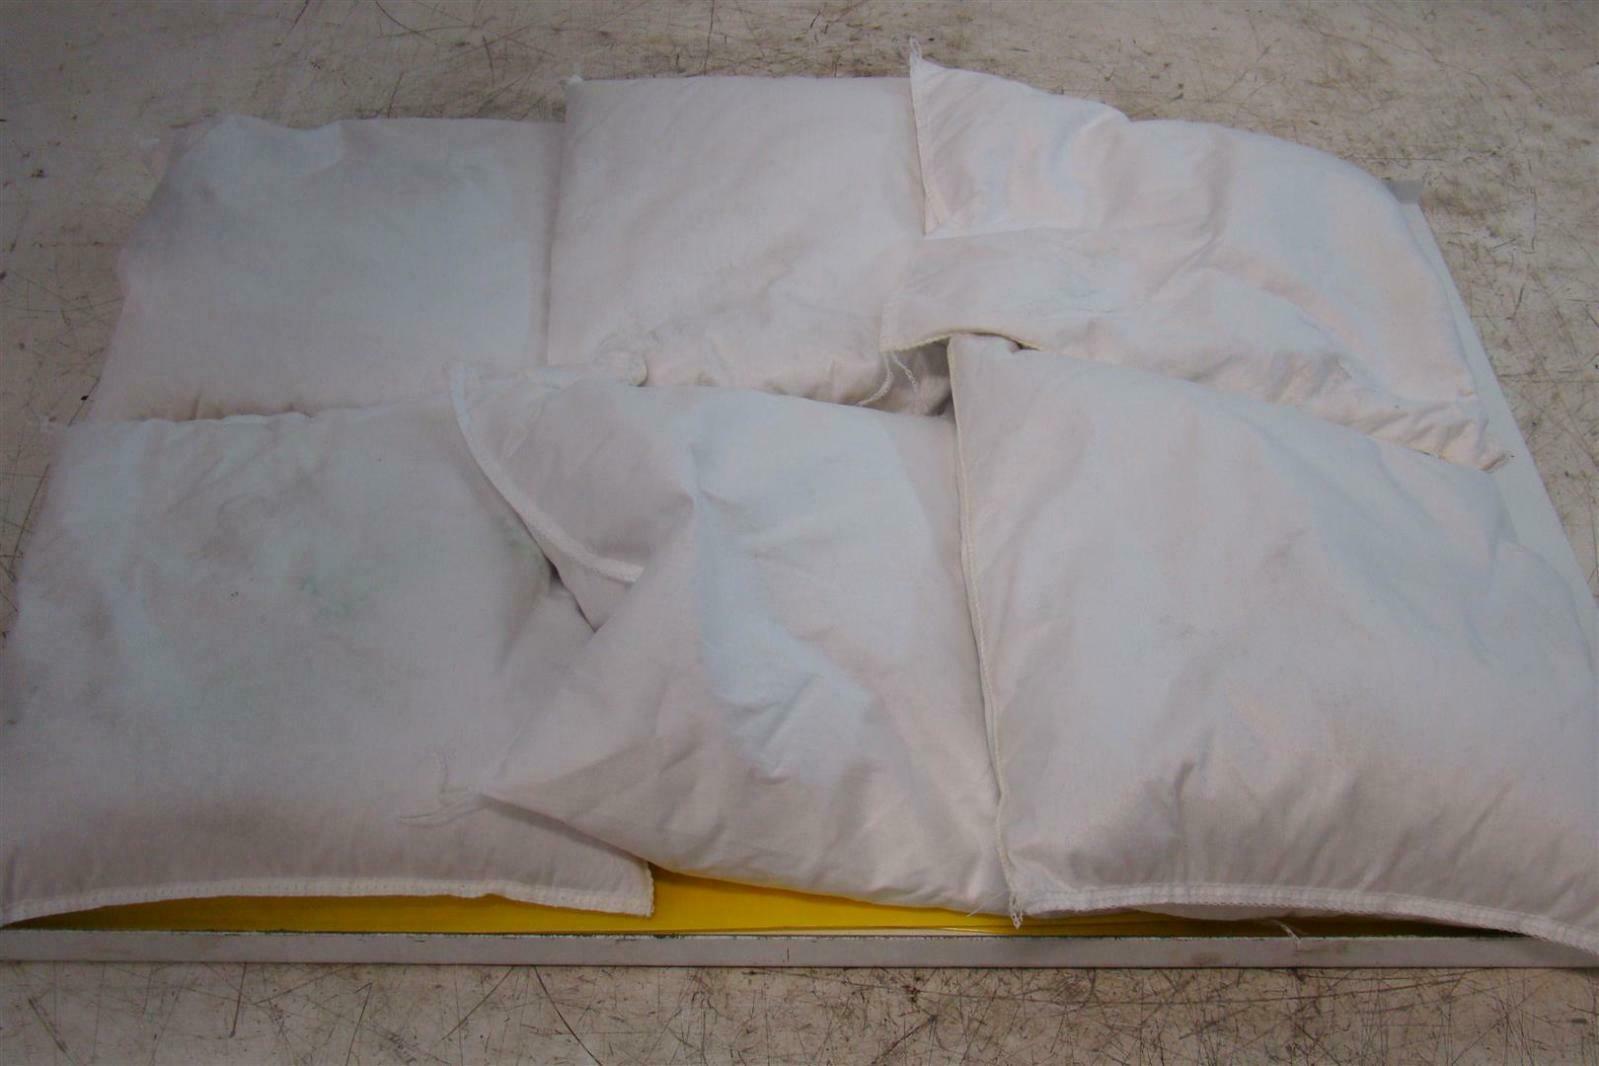 Anti Slip Compound : Wyk safety sorbent anti slip compound universal spill kit